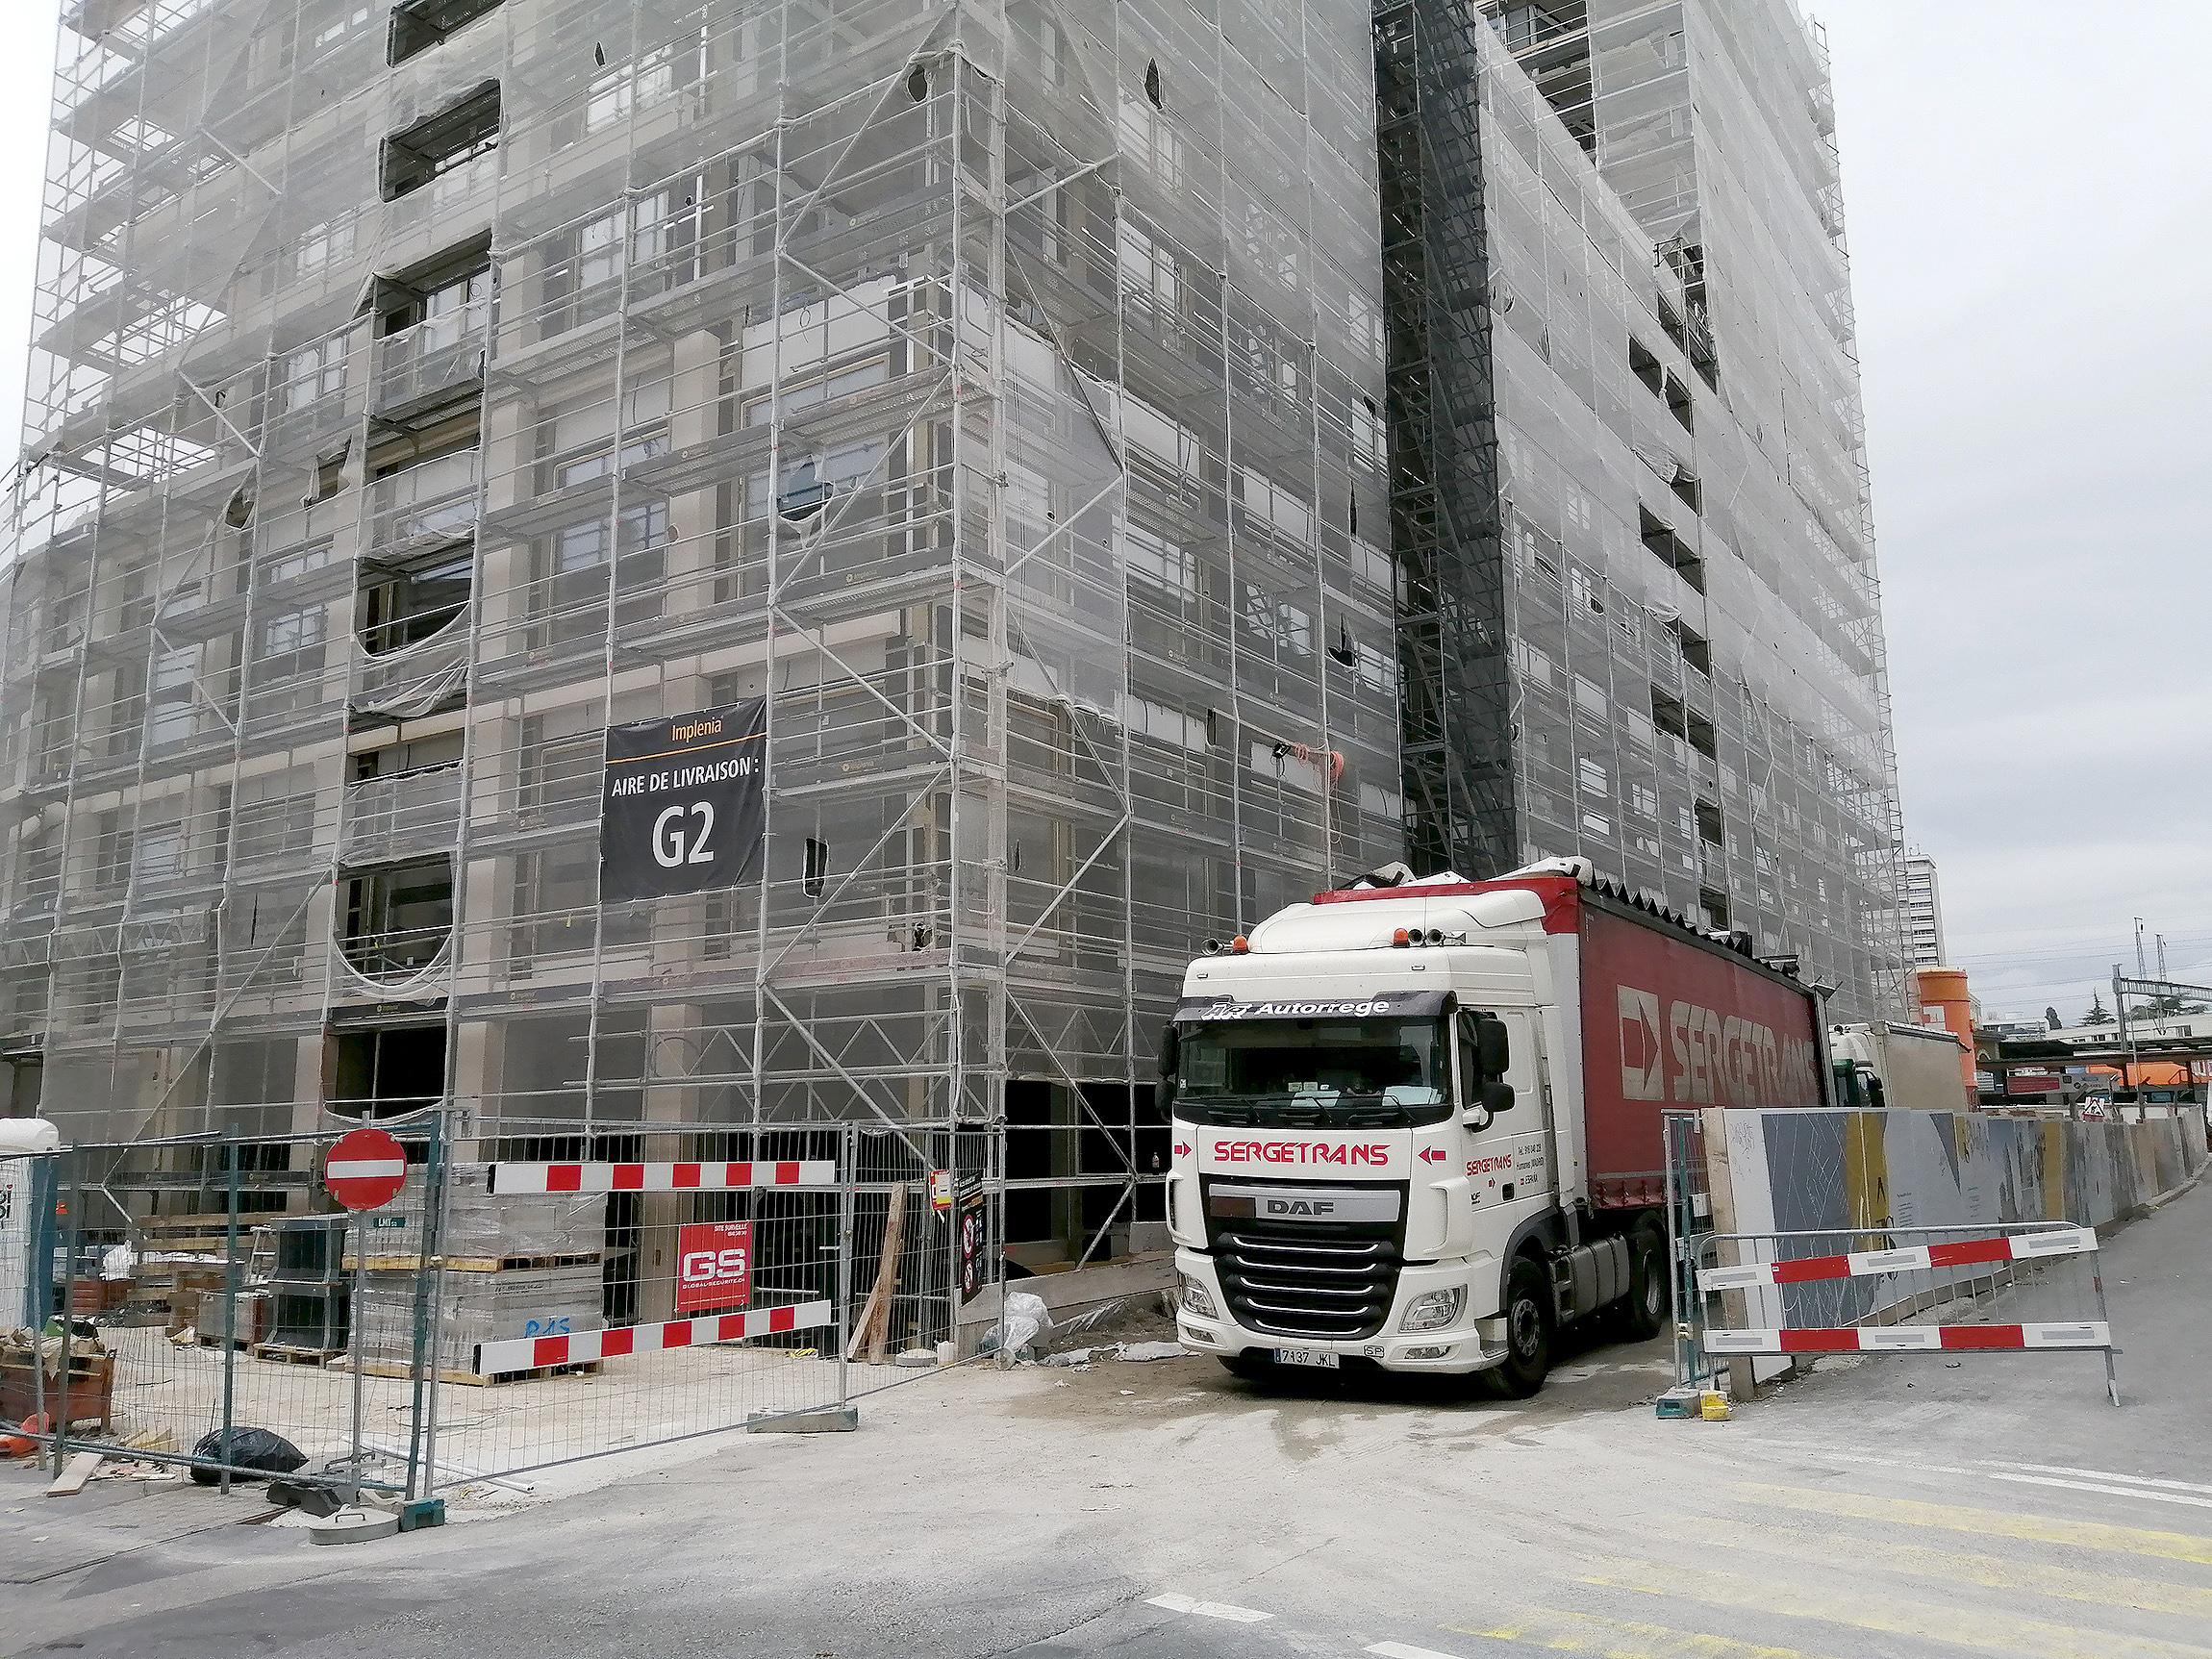 Des camions espagnols font jaser